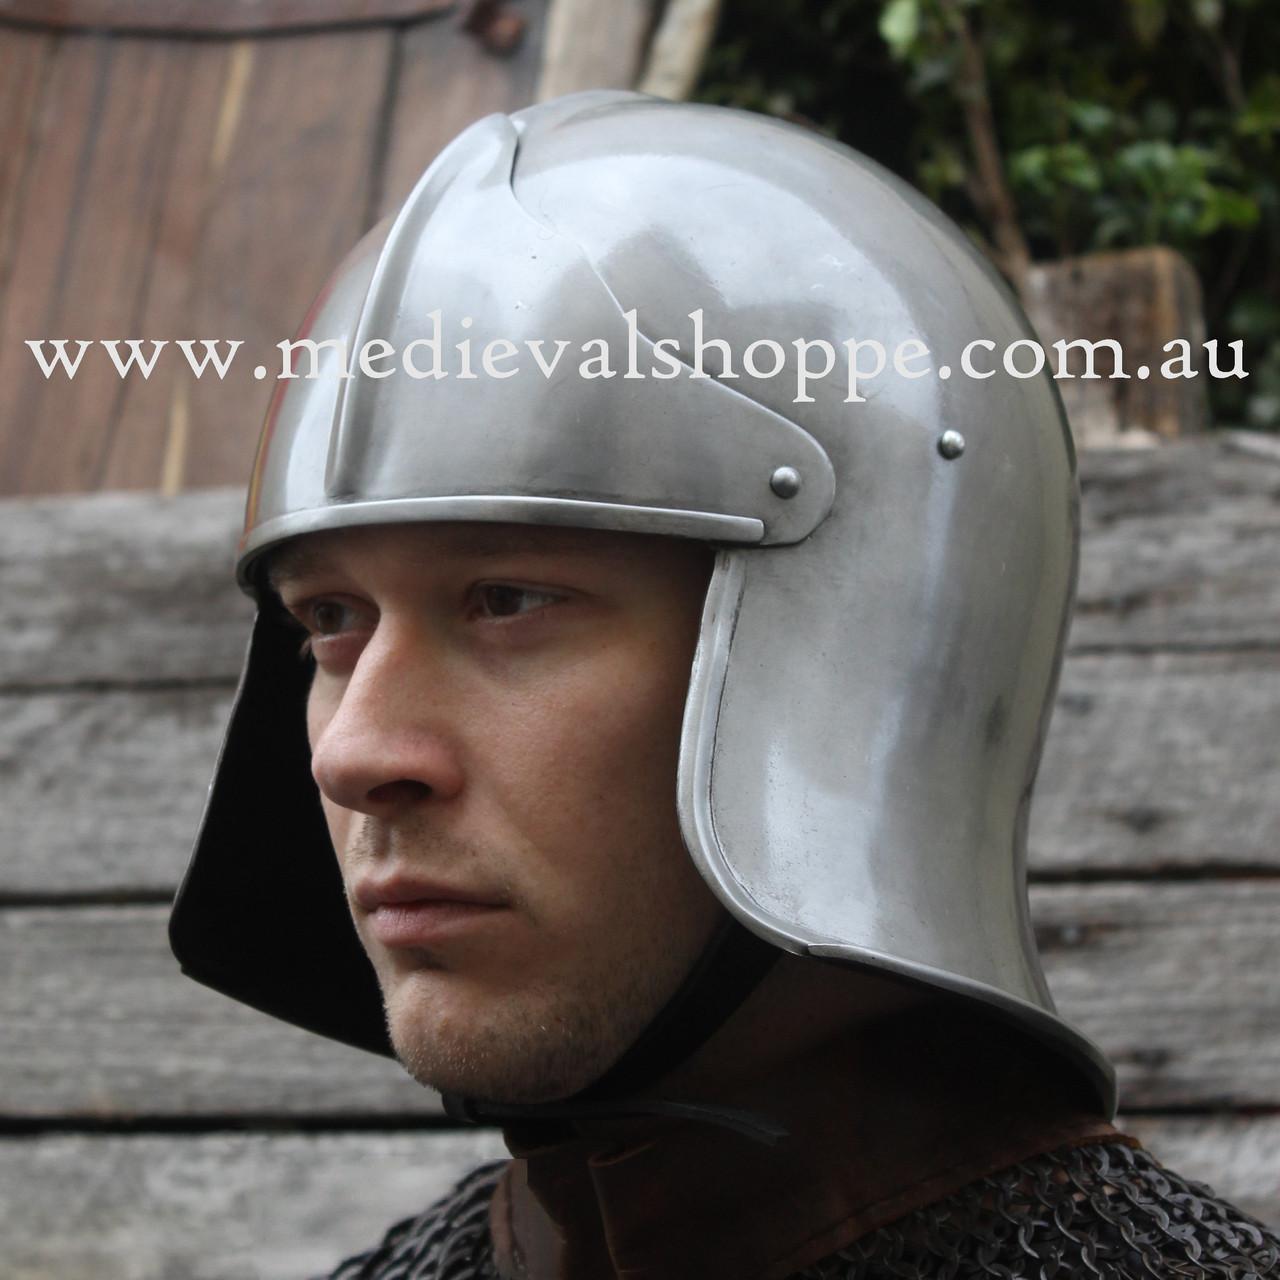 Late 15th Century Celeta Helmet